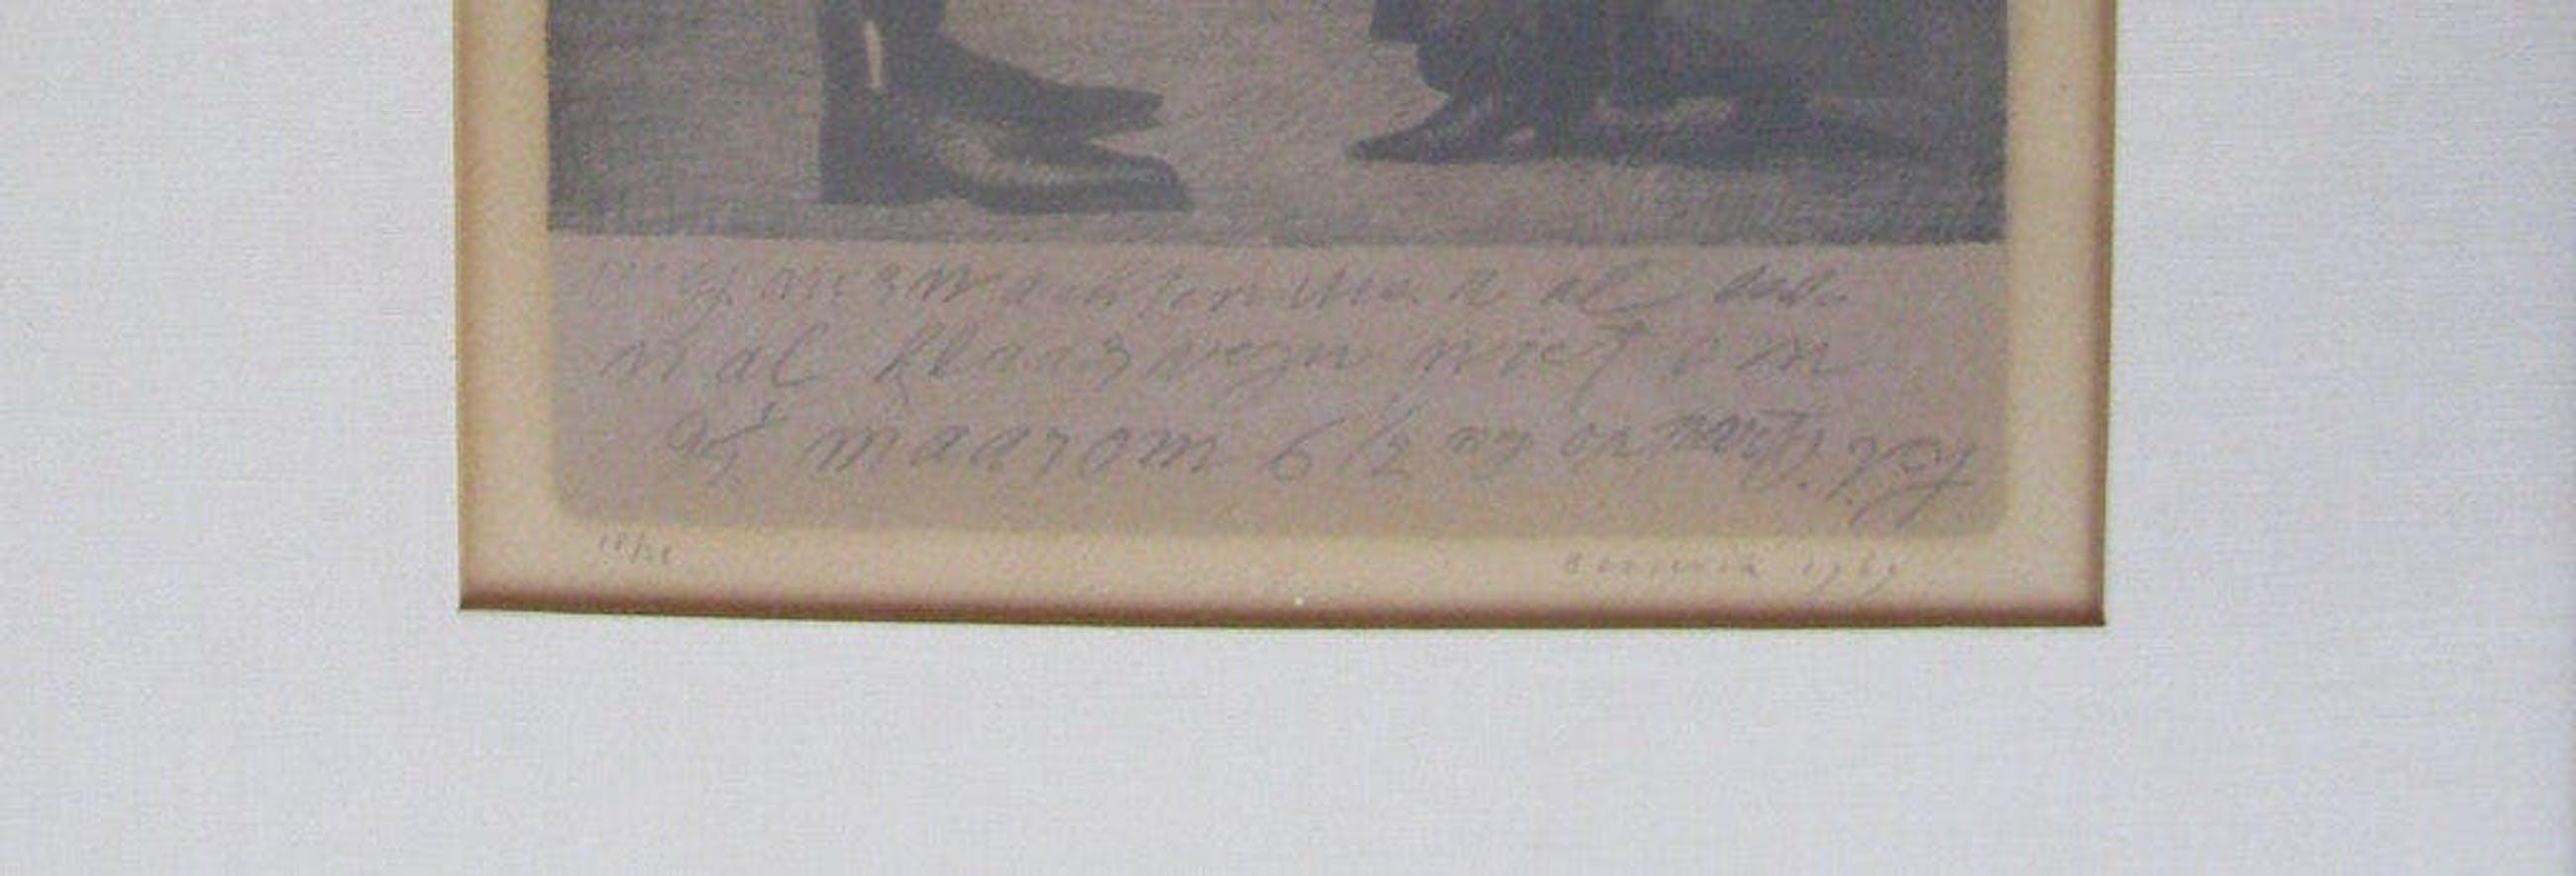 Herman Berserik - Hermanus Berserik, 2-kleuren litho, ontmoeting kopen? Bied vanaf 245!